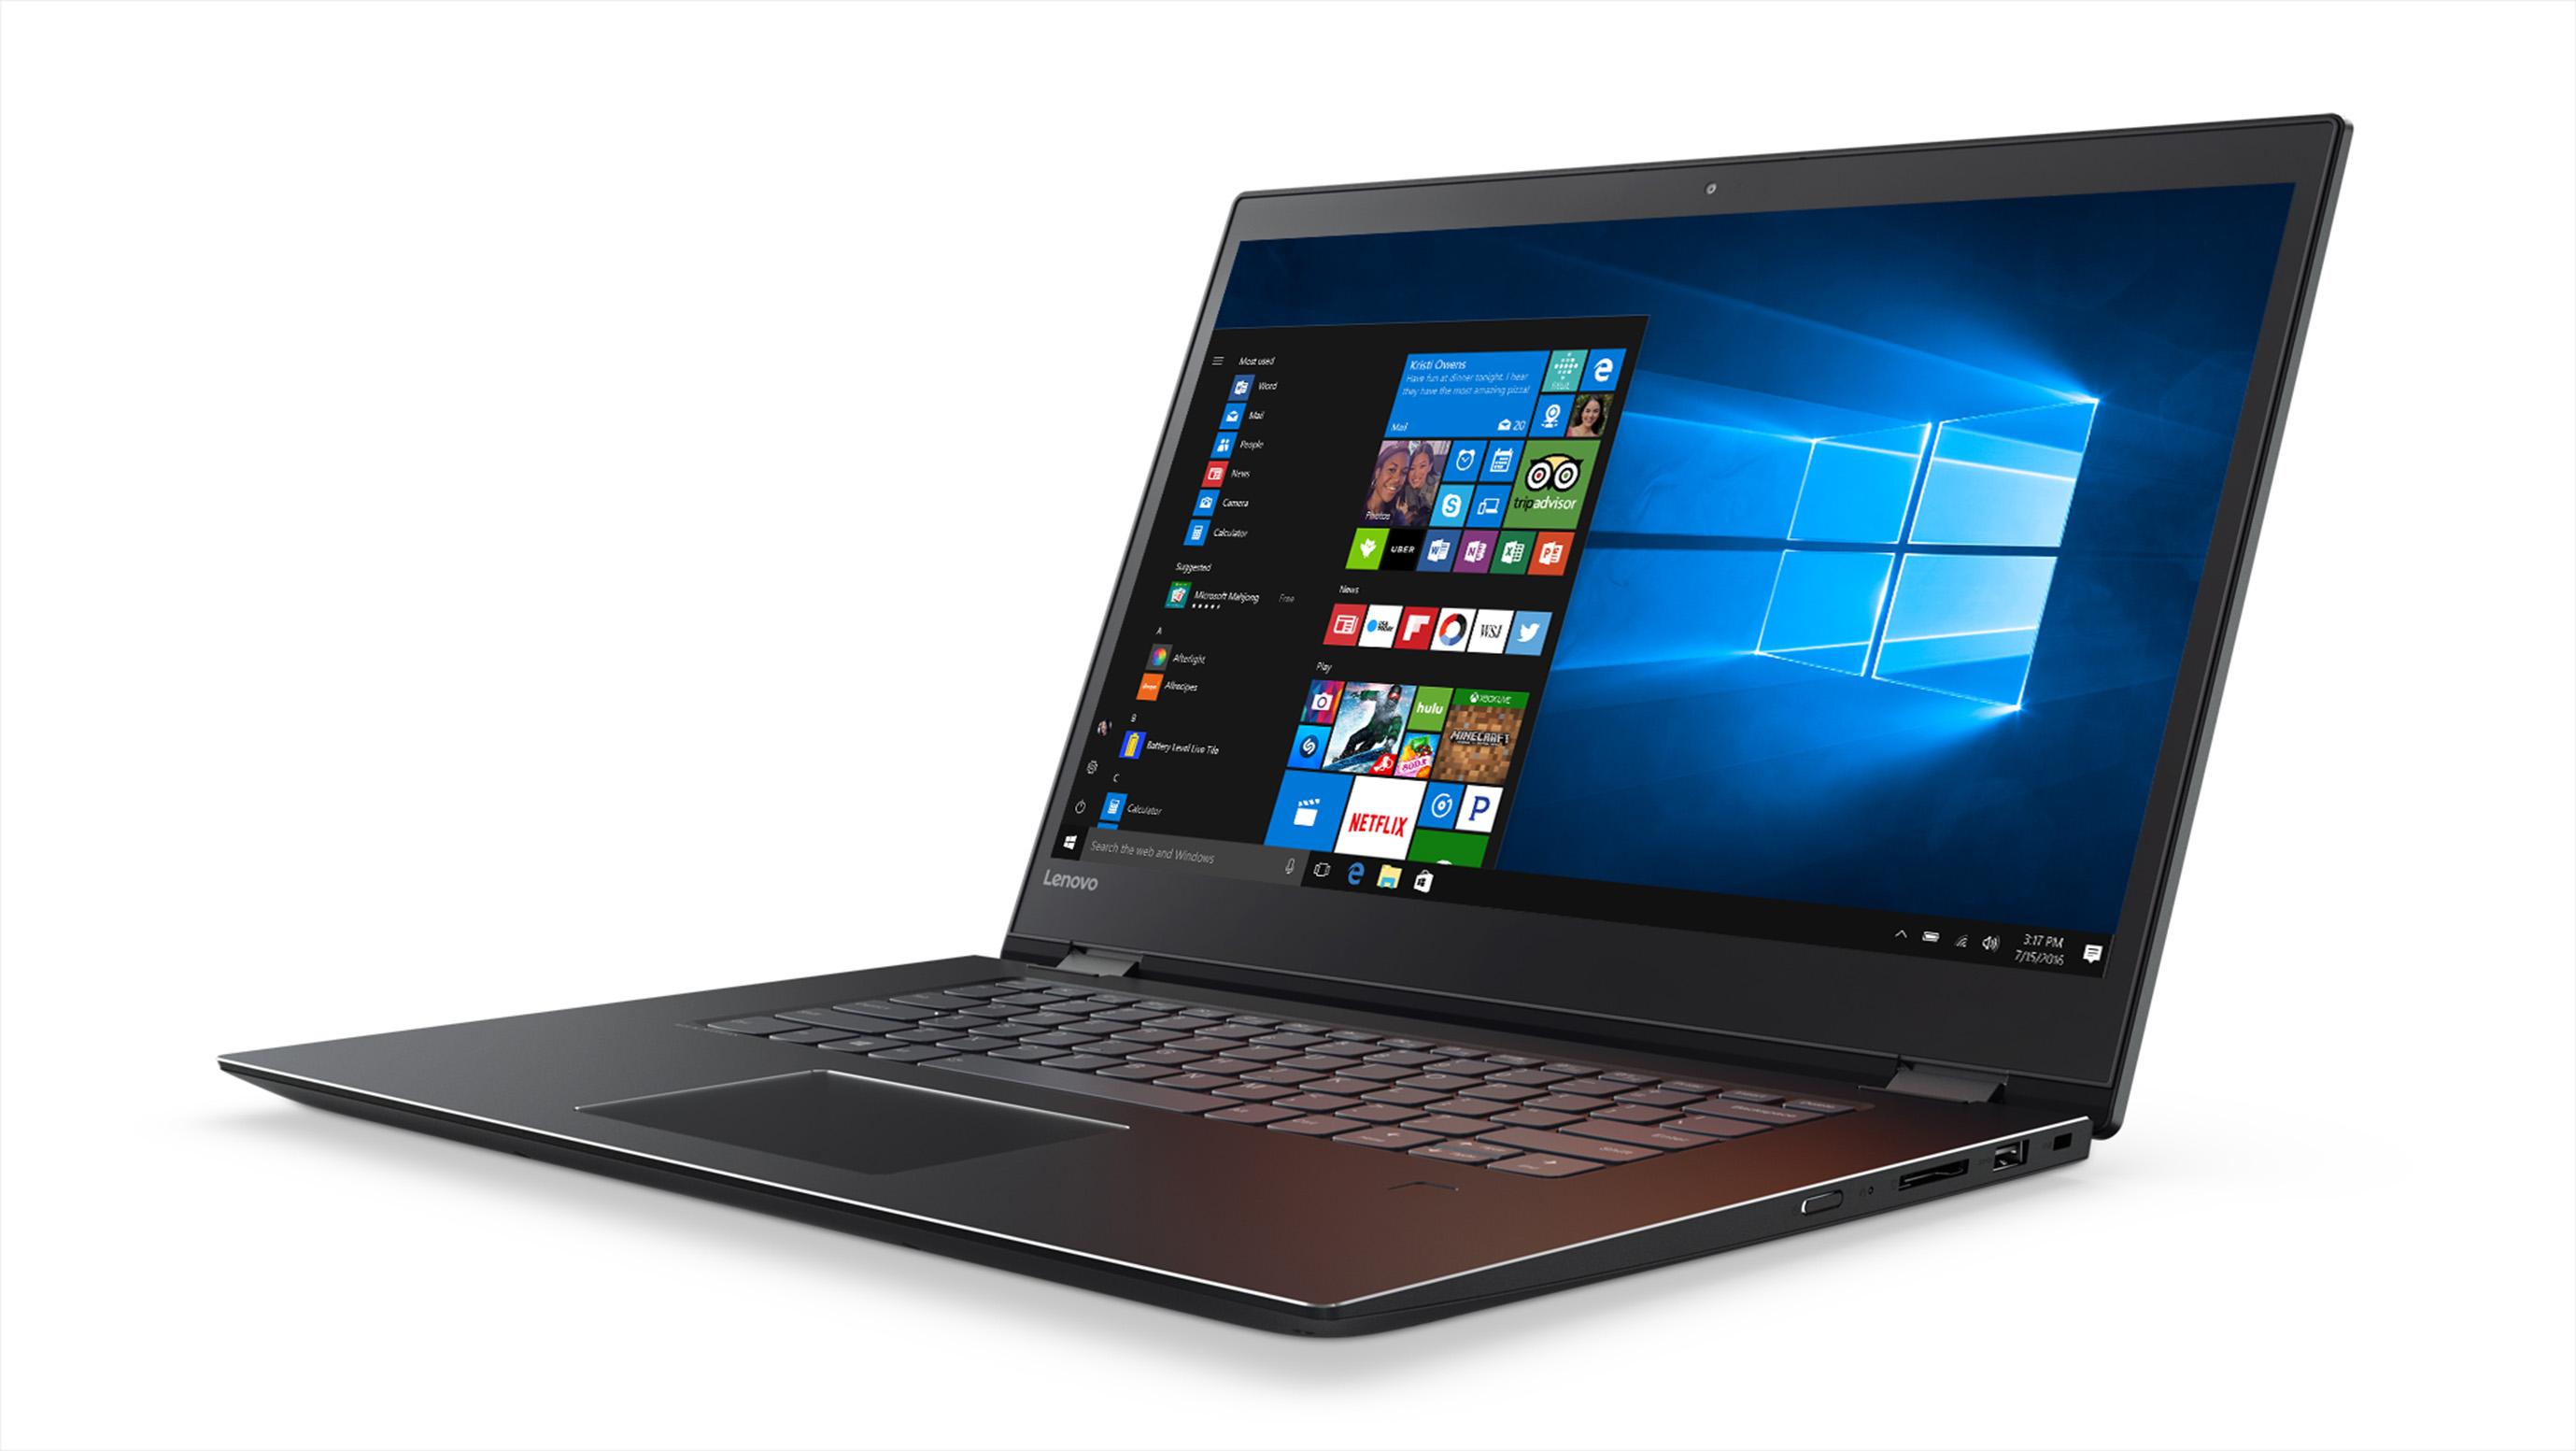 Lenovo Ideapad Flex 5 15 80XB0005US 2 in 1 PC Deal